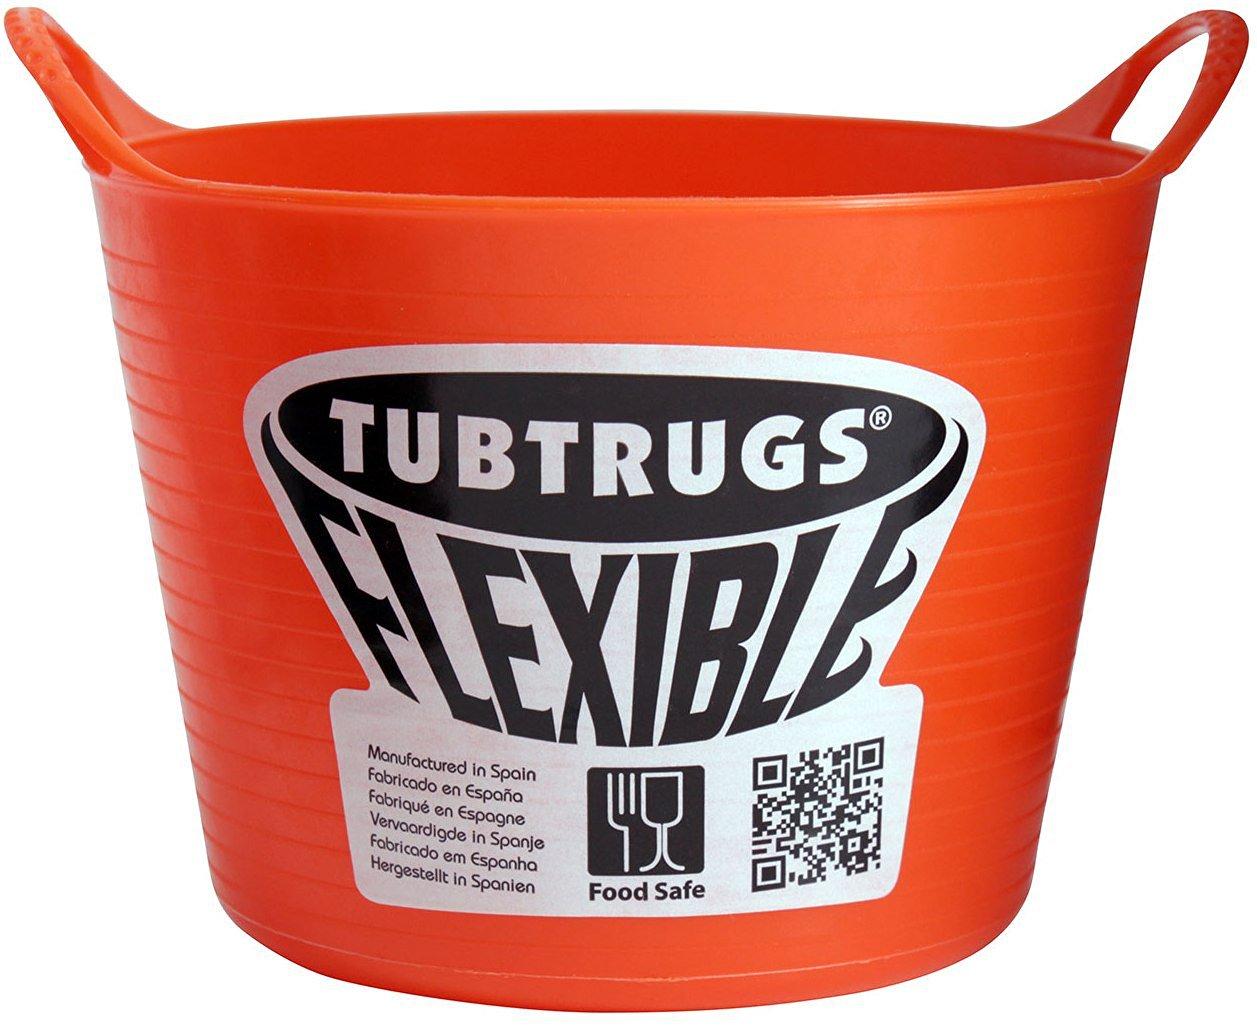 Tubtrugs SPMICO Flexible Orange Micro .37 Liter/12.5 Ounce Capacity